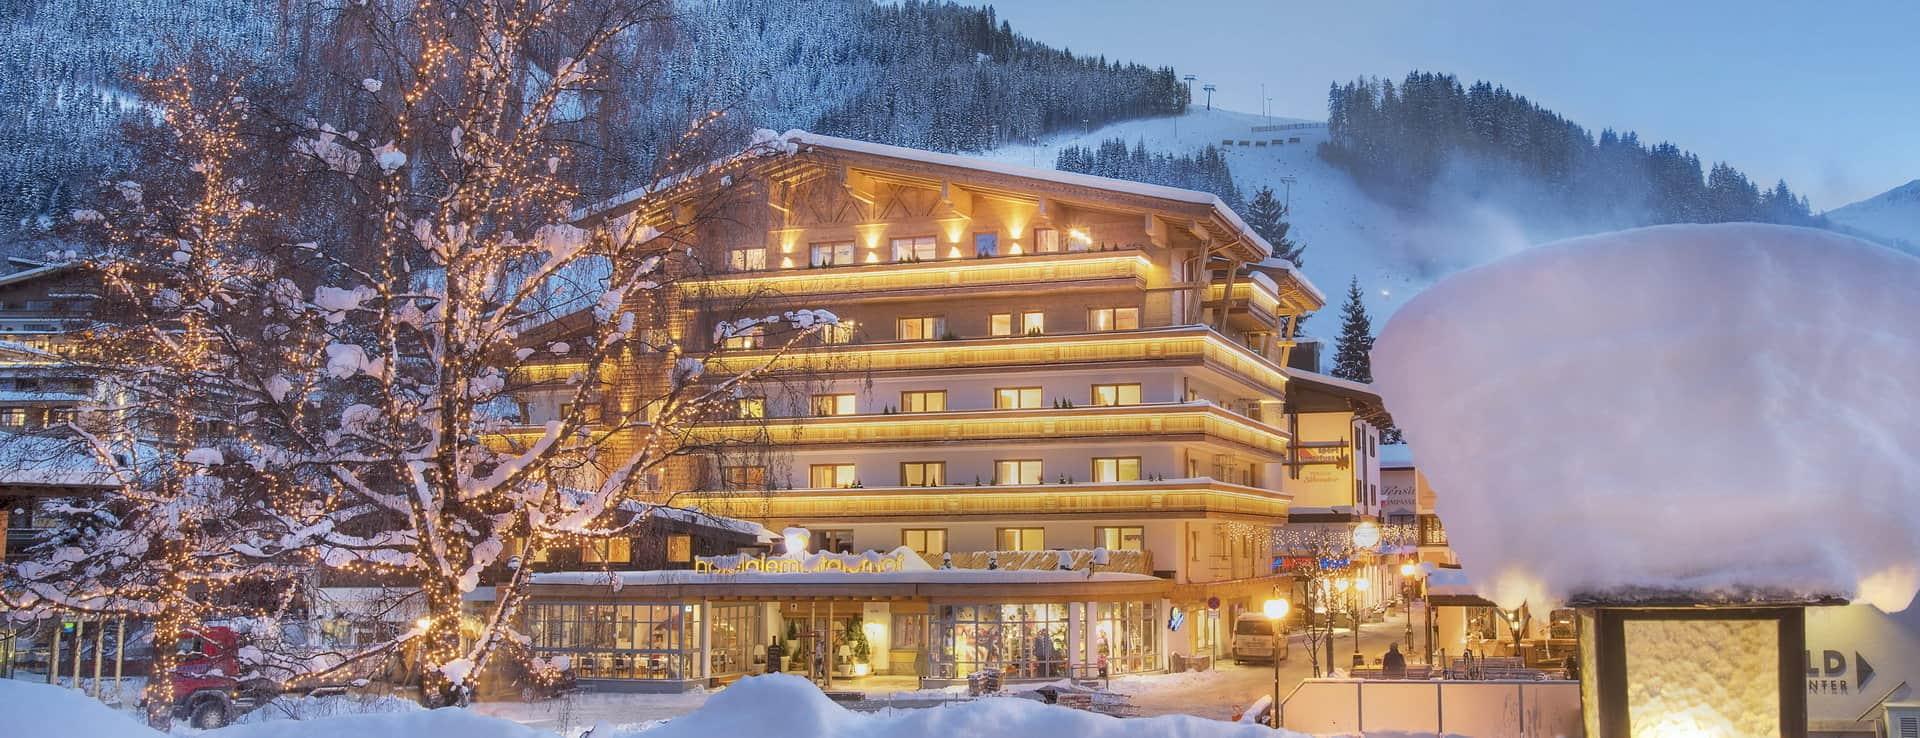 Hotel Glemmtalerhof 4****Superior i Hinterglemm